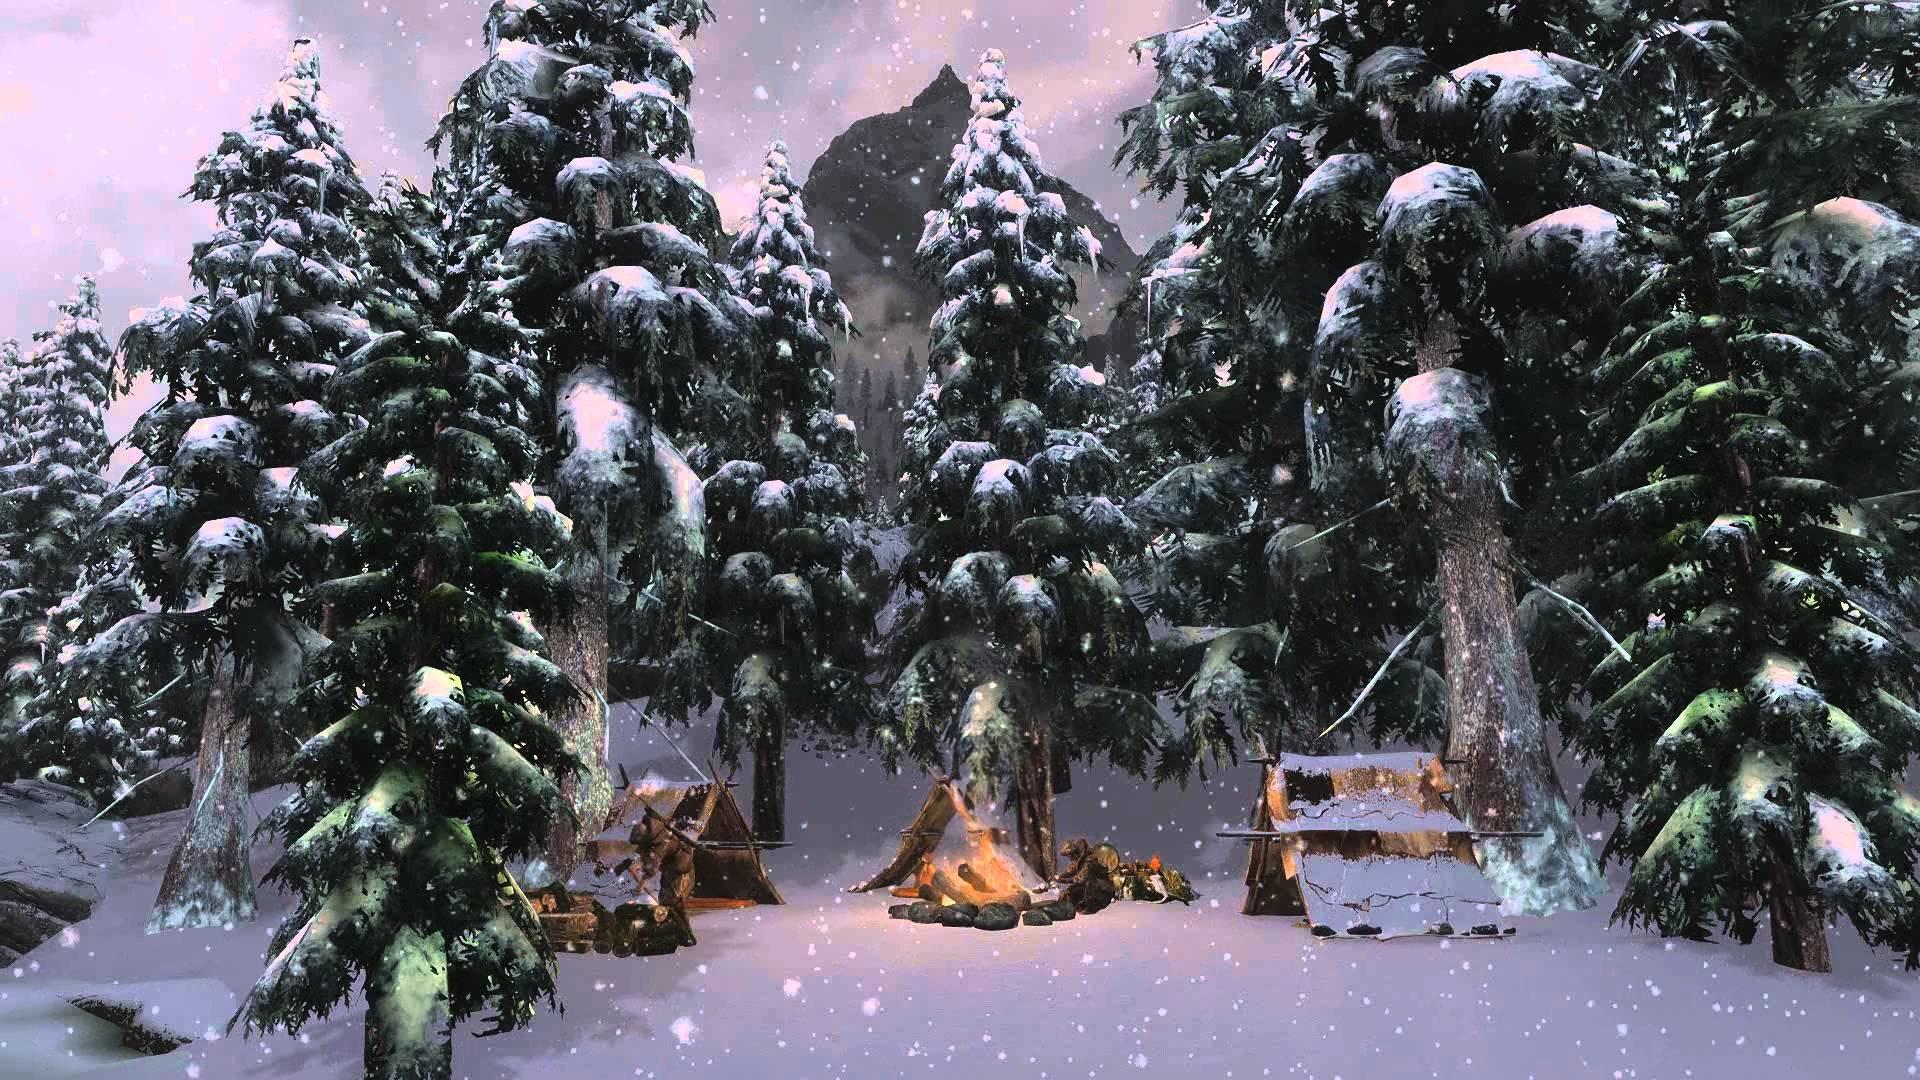 Animated Desktop Wallpaper – Winter Skyrim – Campfire